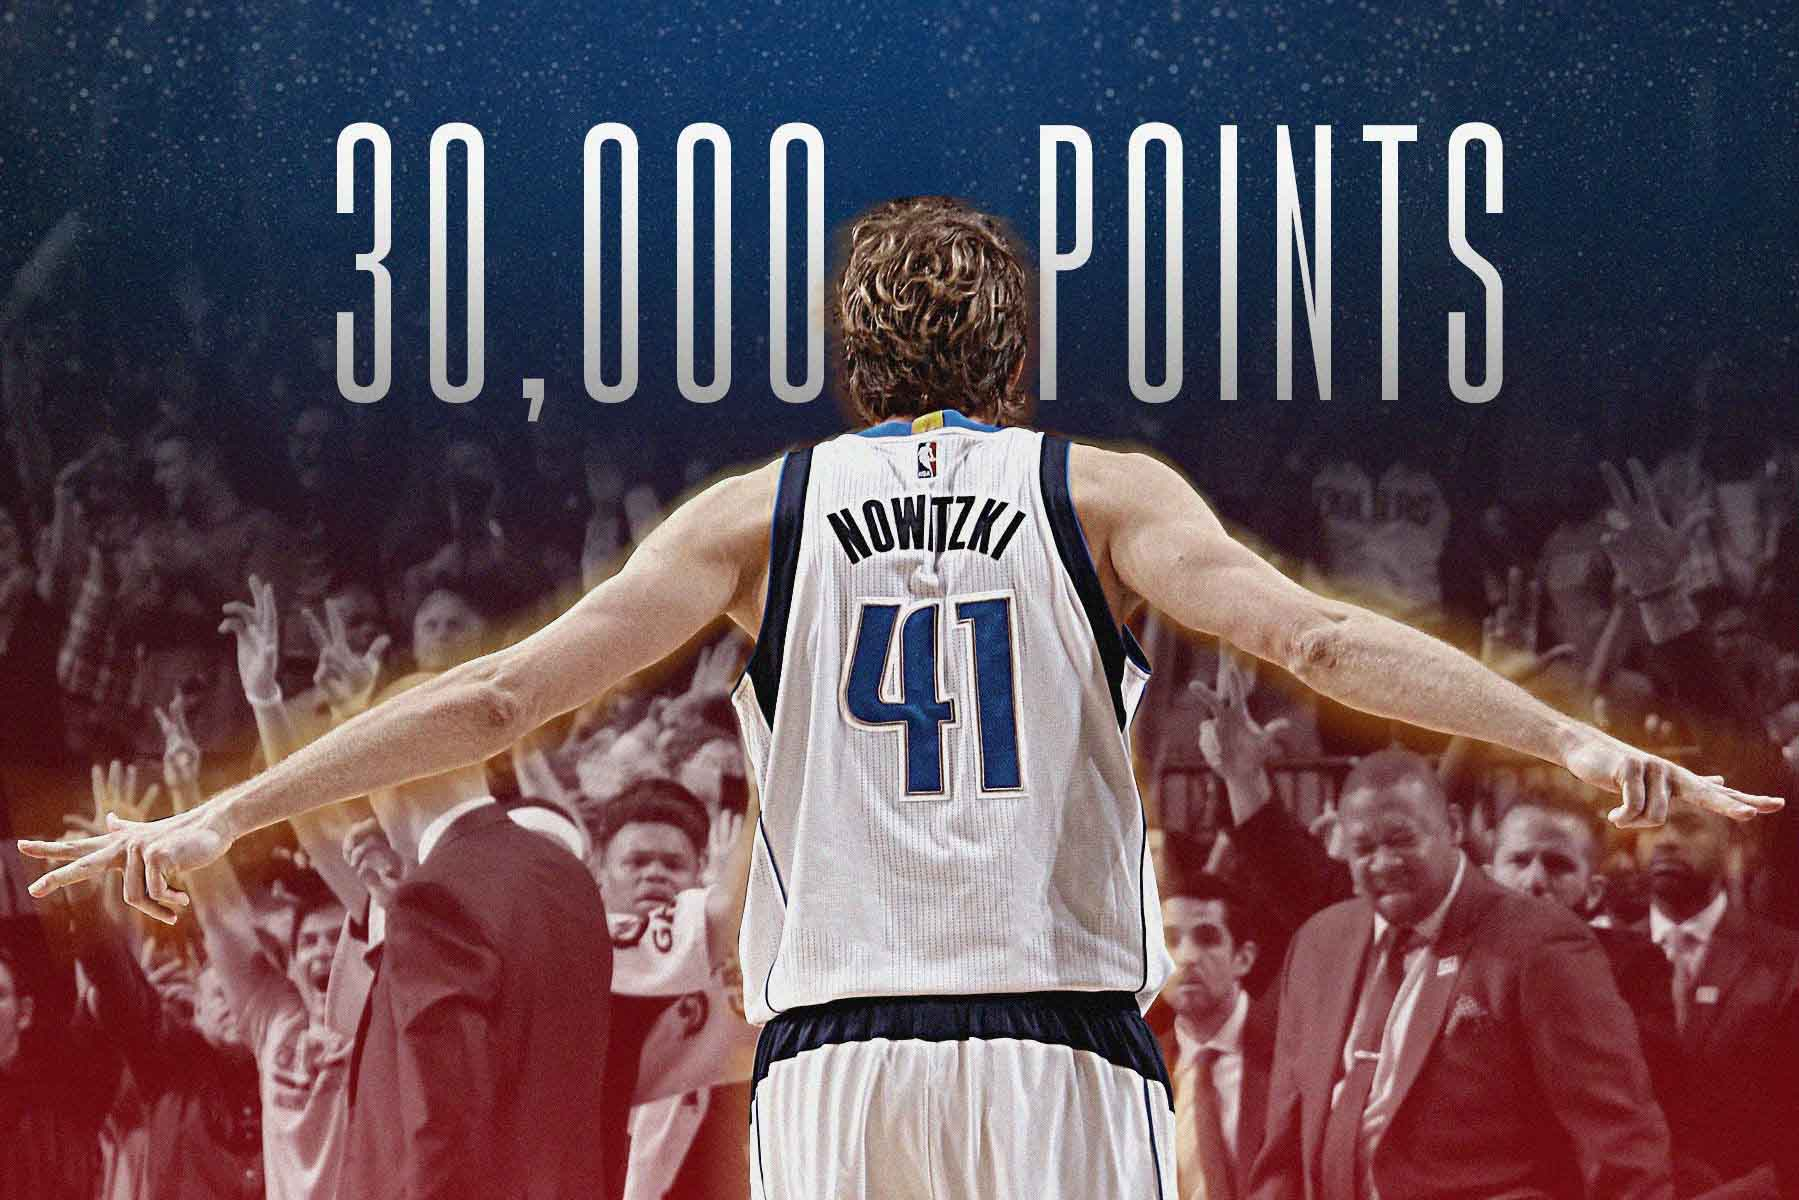 Nowitzki In Elite Company, Passes 30K Career Points Landmark